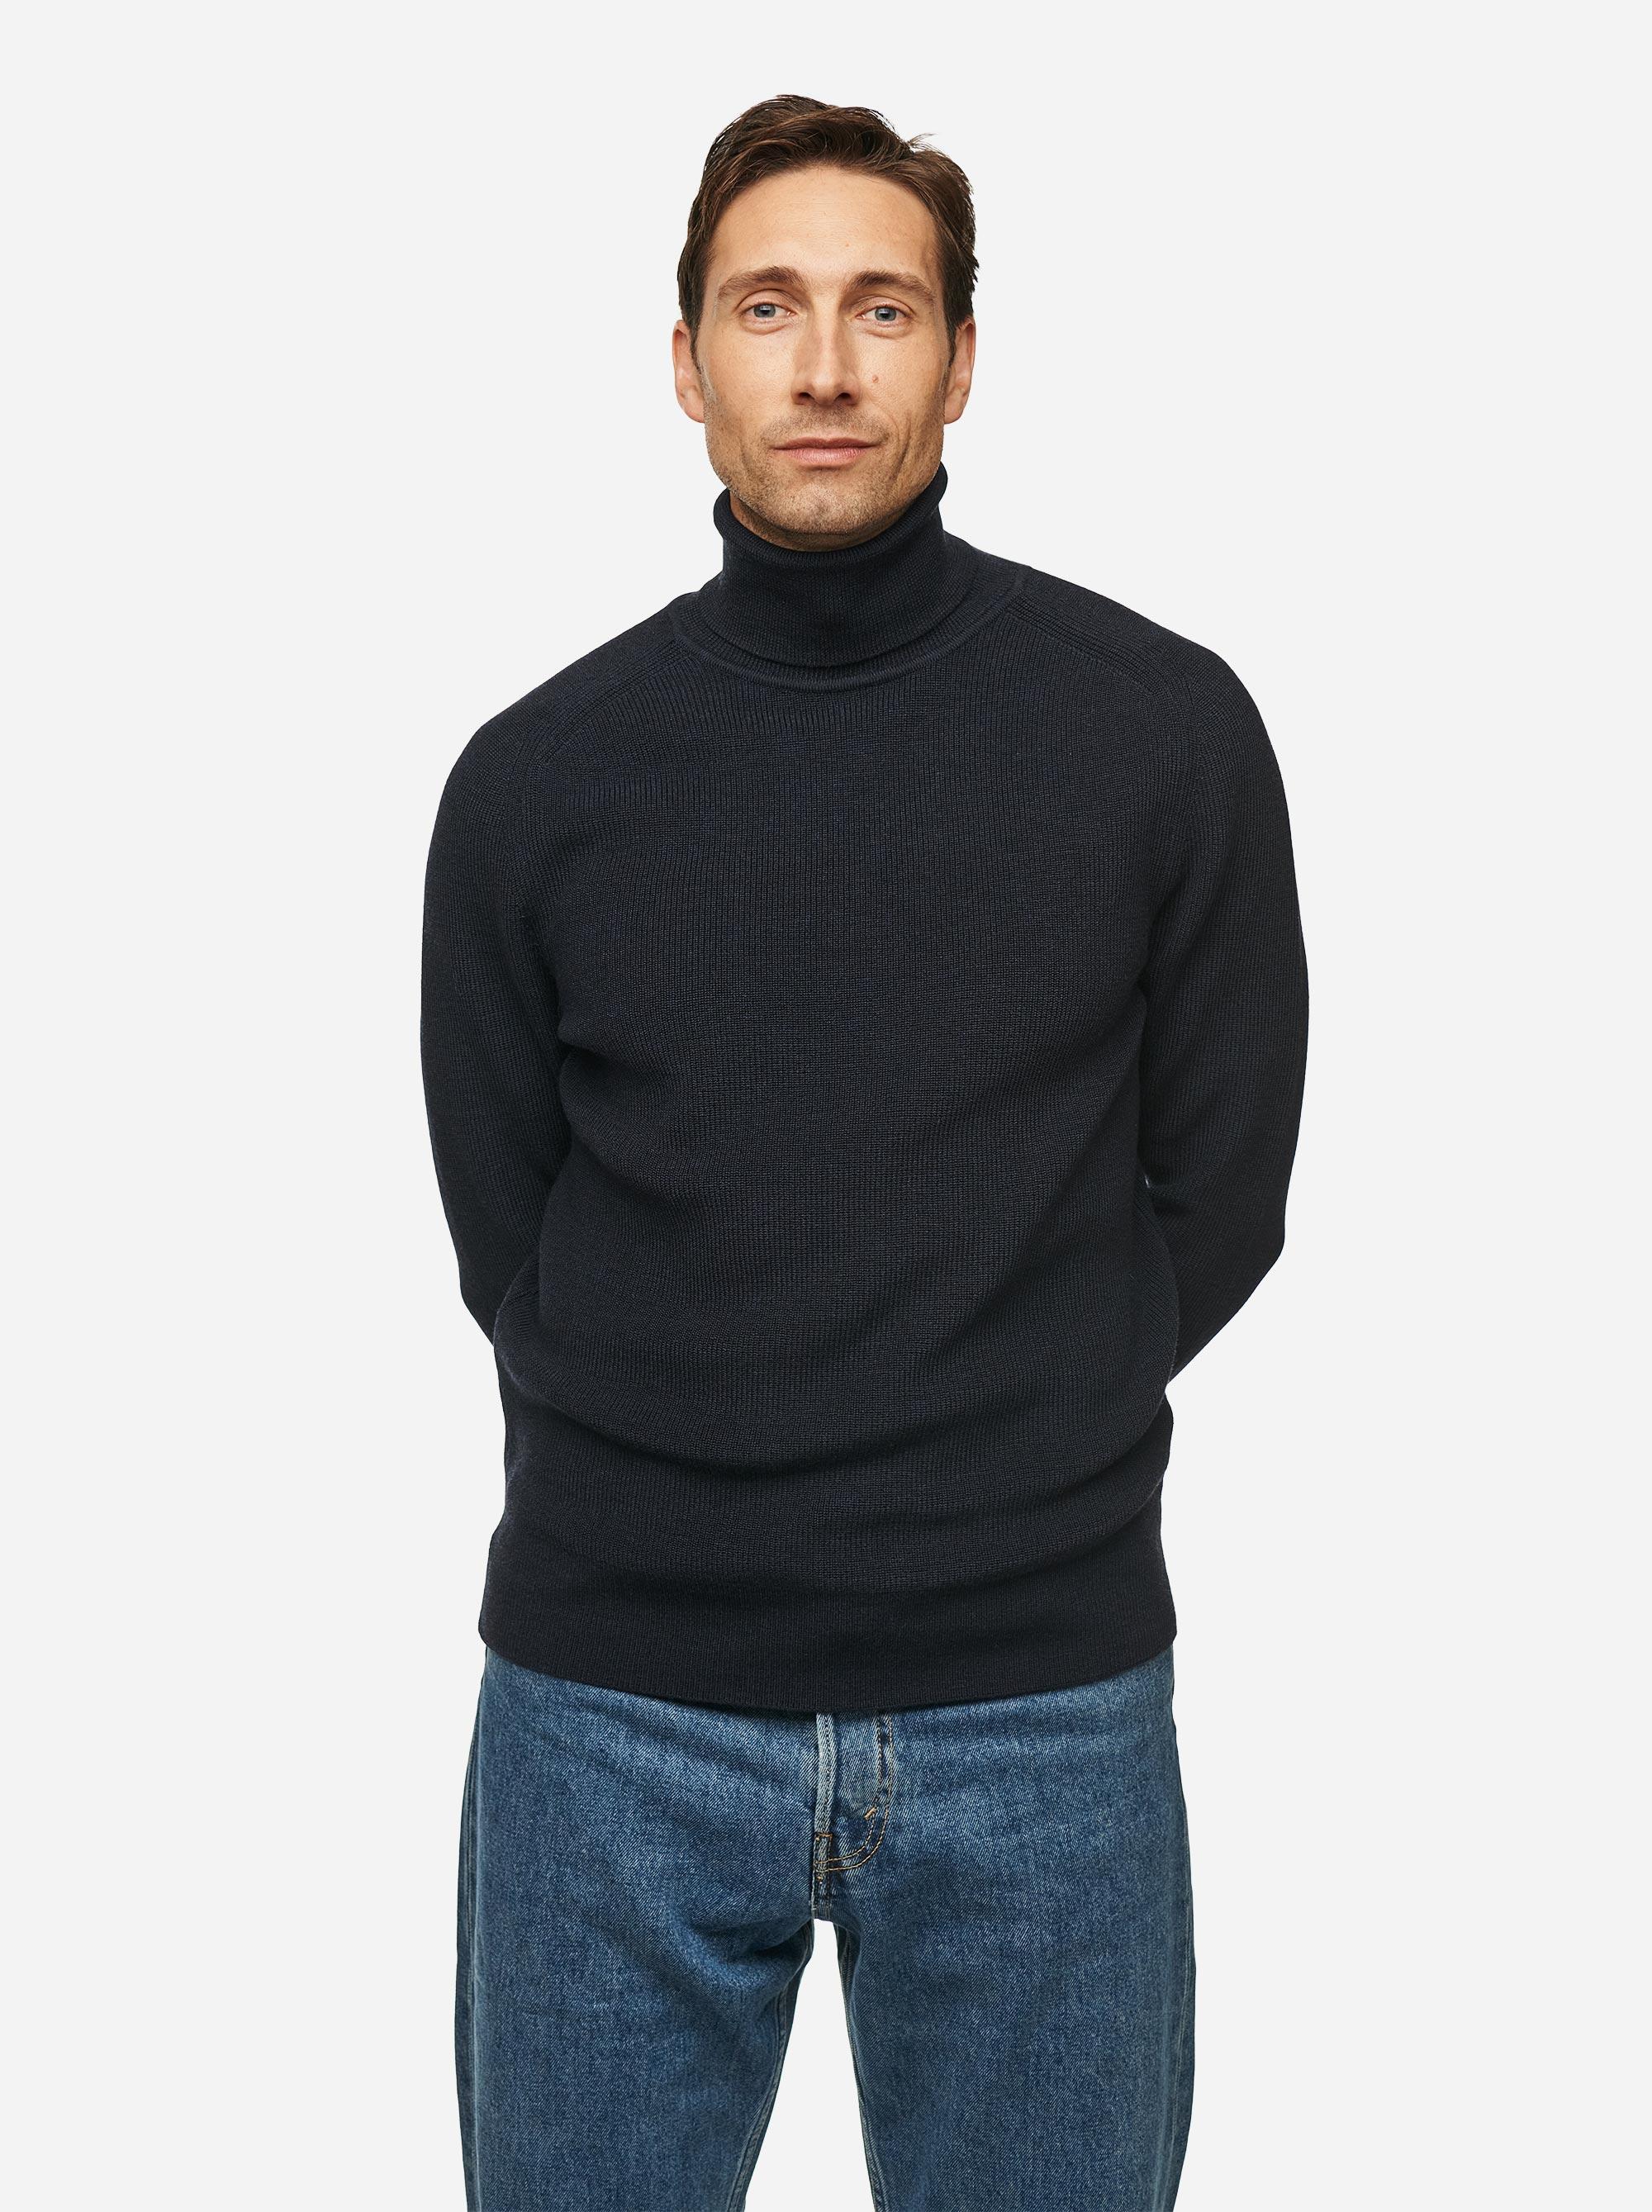 Teym - Turtleneck - The Merino Sweater - Men - Blue - 1